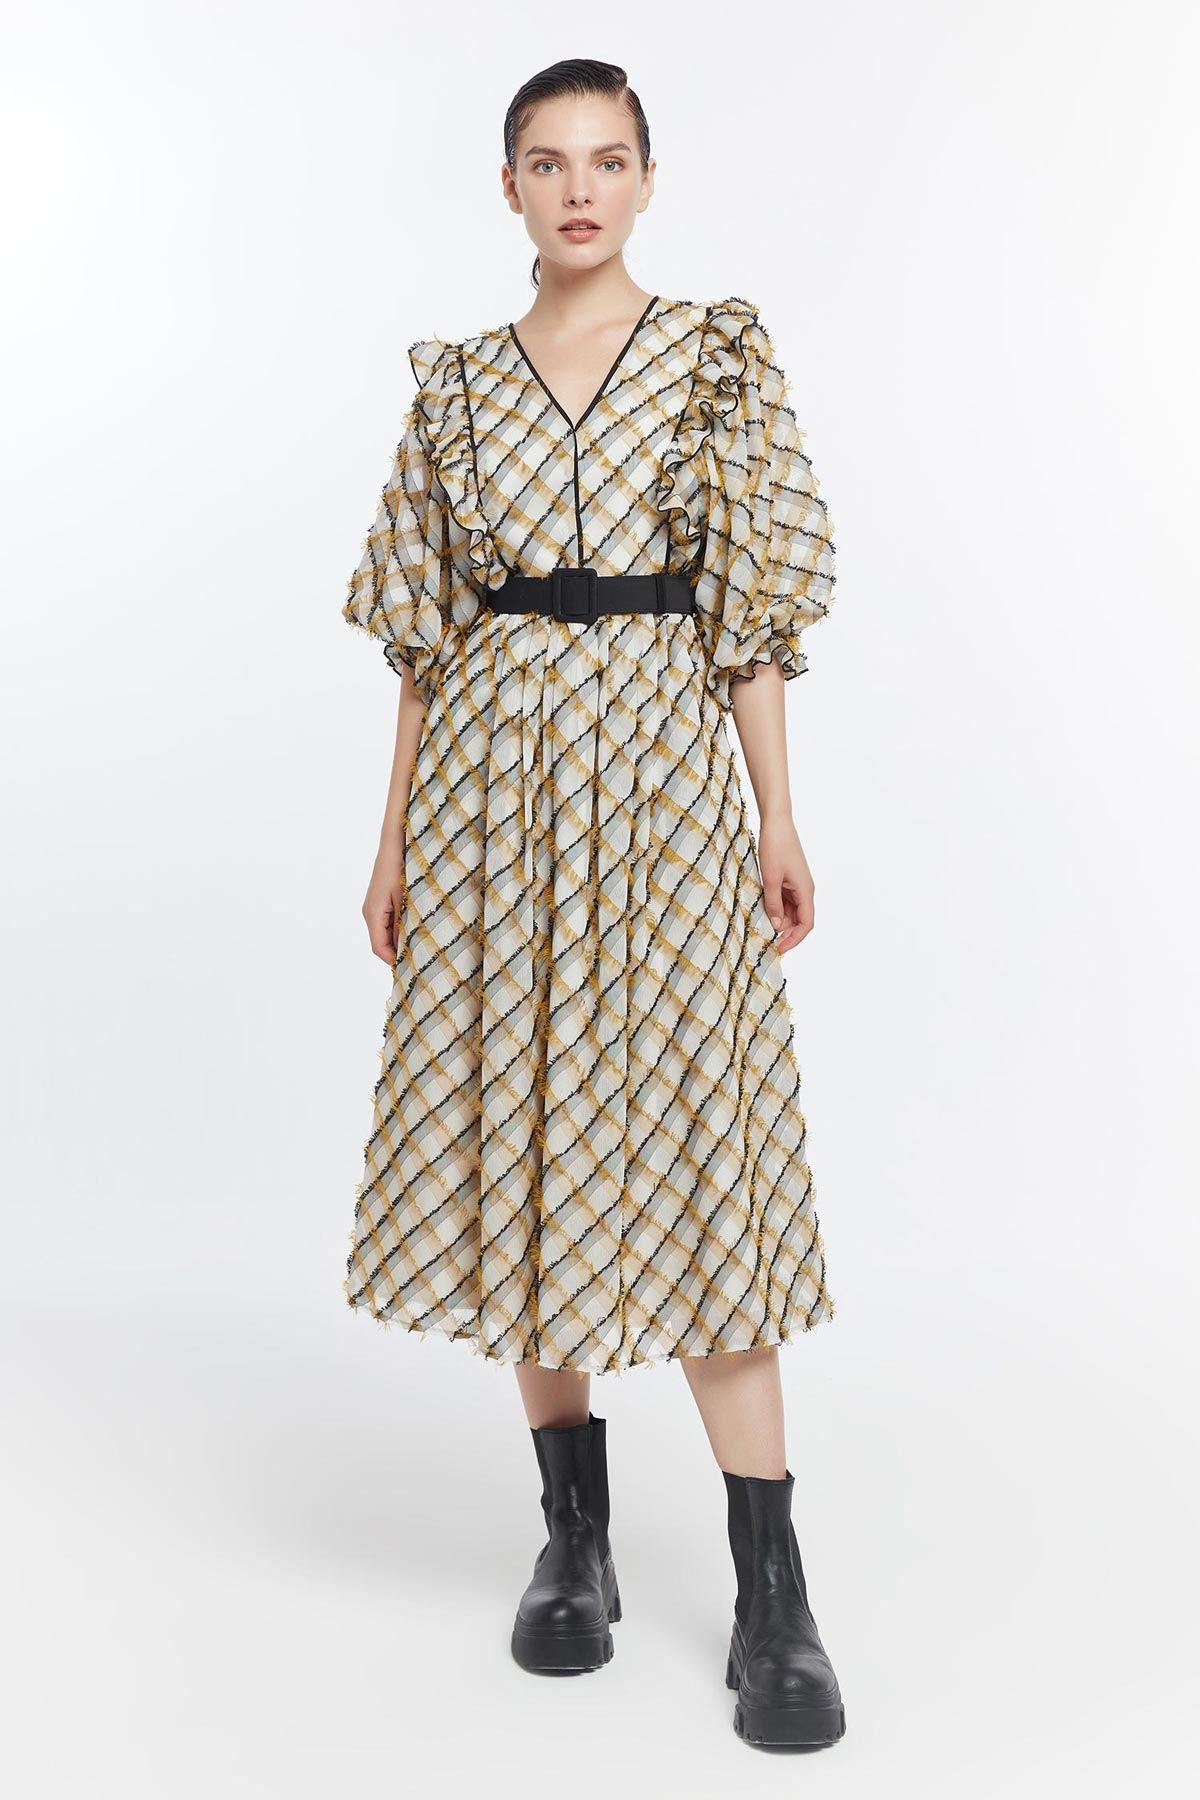 Balon kol püskül detaylı elbise Safran